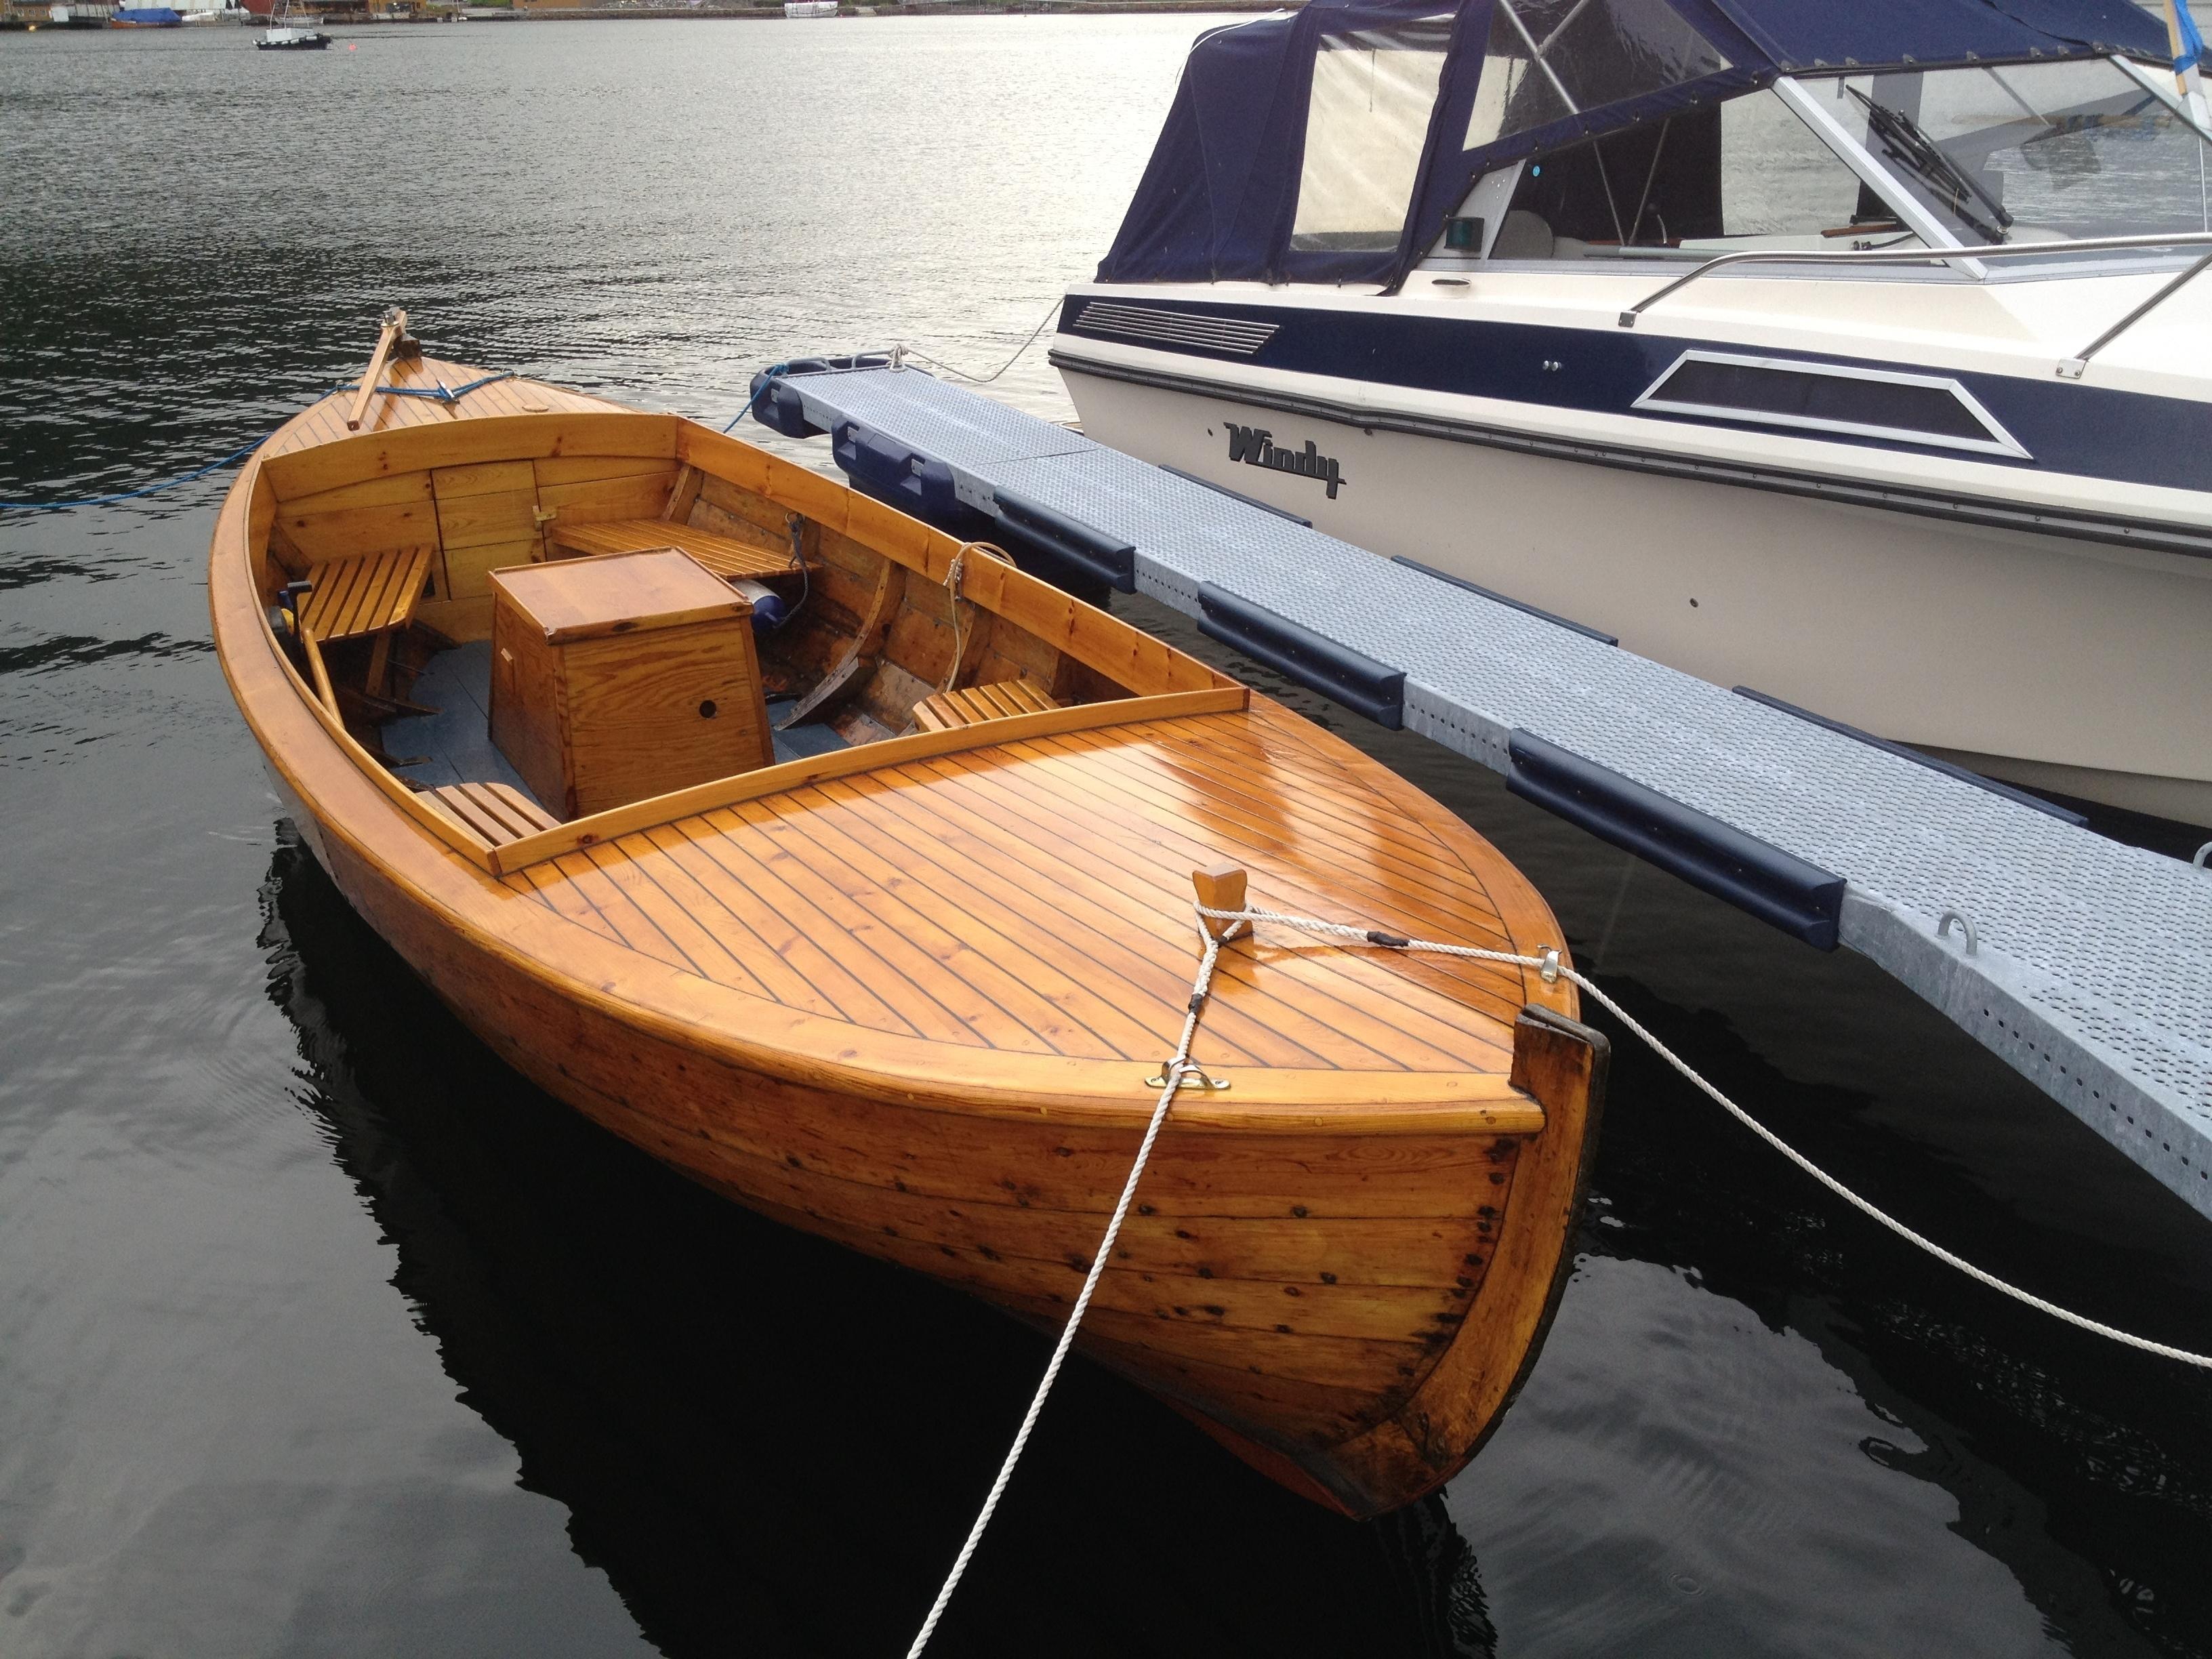 https://marinasolutions.no/uploads/Norheimsund-Båtlag_Båtplass.JPG